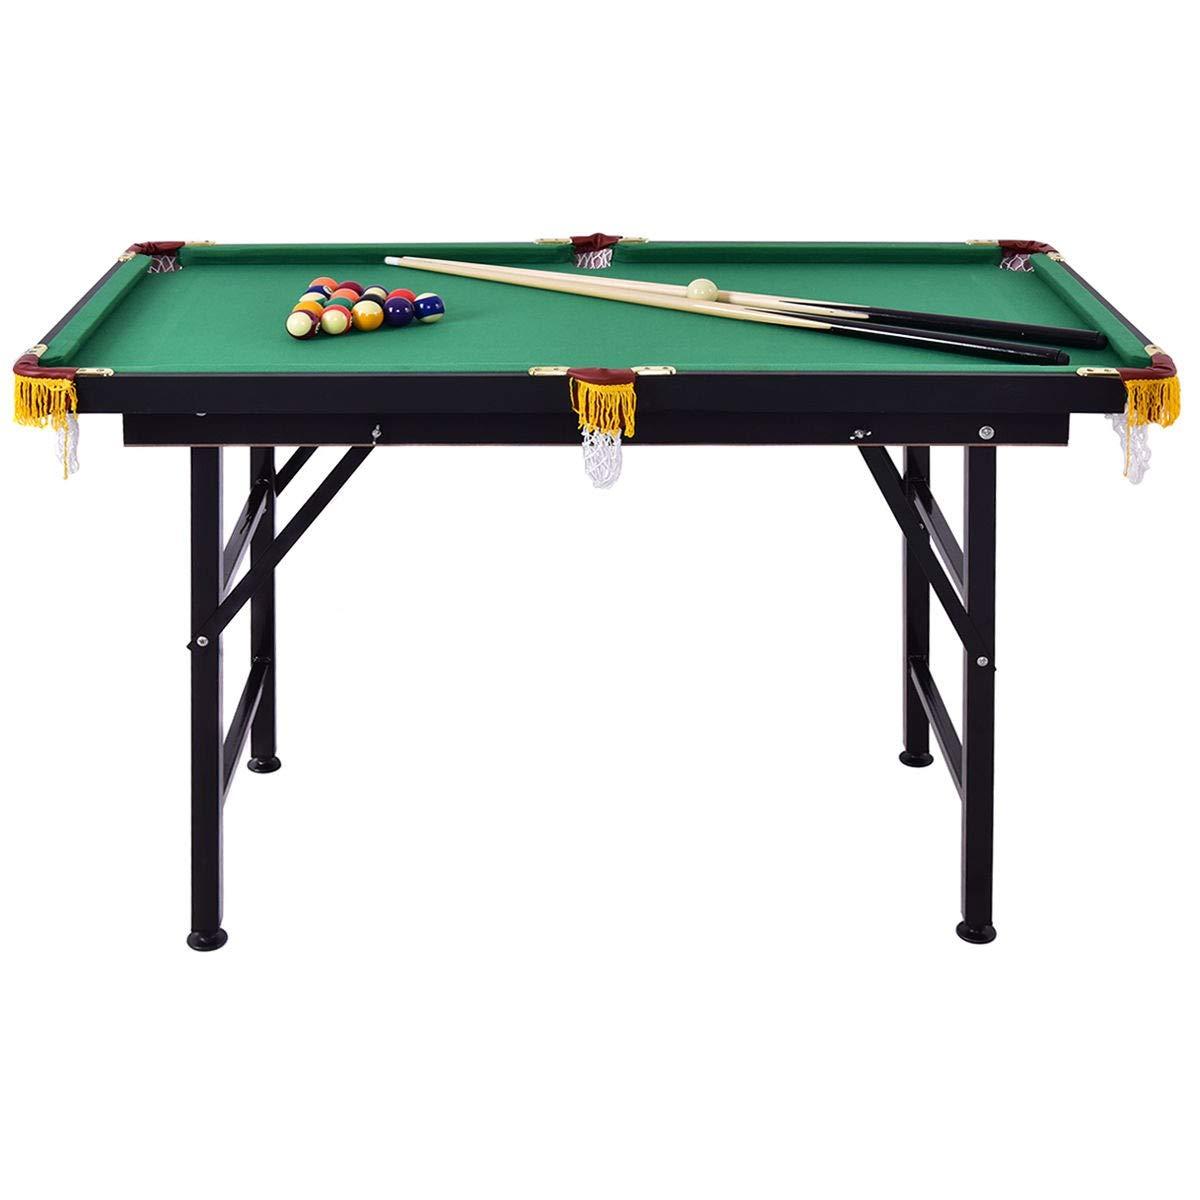 47'' Billiard Pool Table Full Game Set by Abbeydh